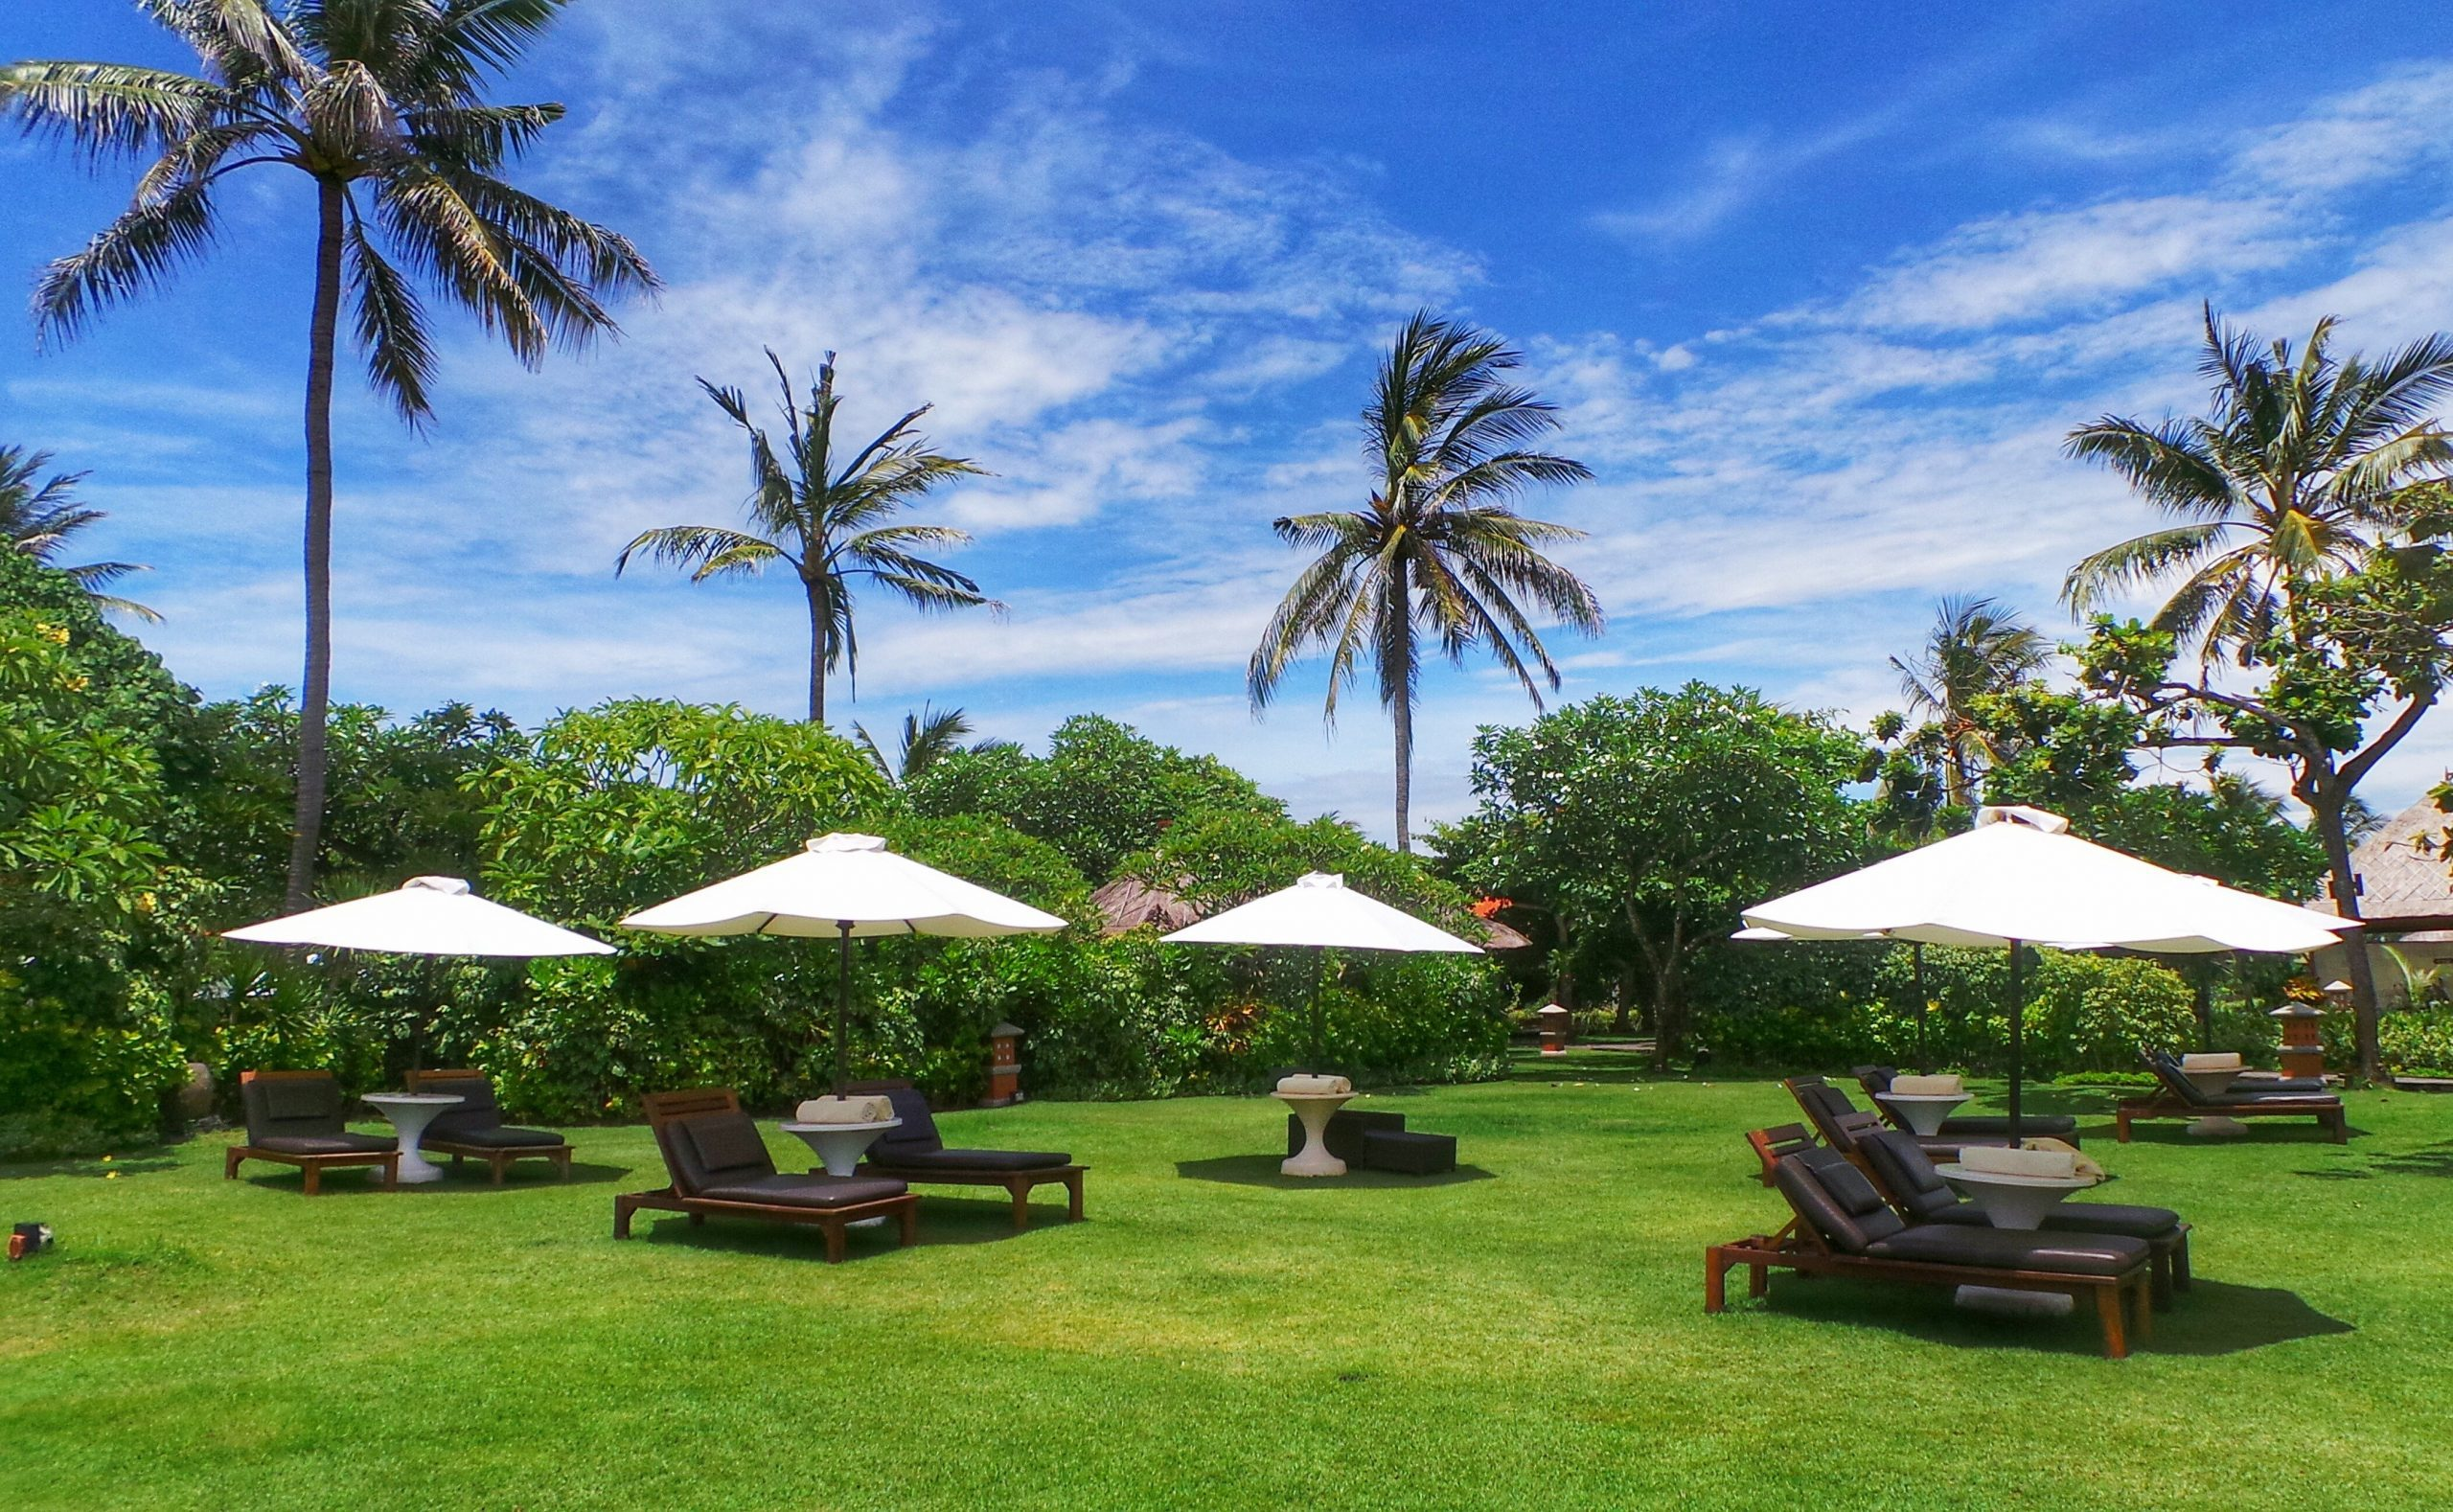 The Ayodya Resort Bali